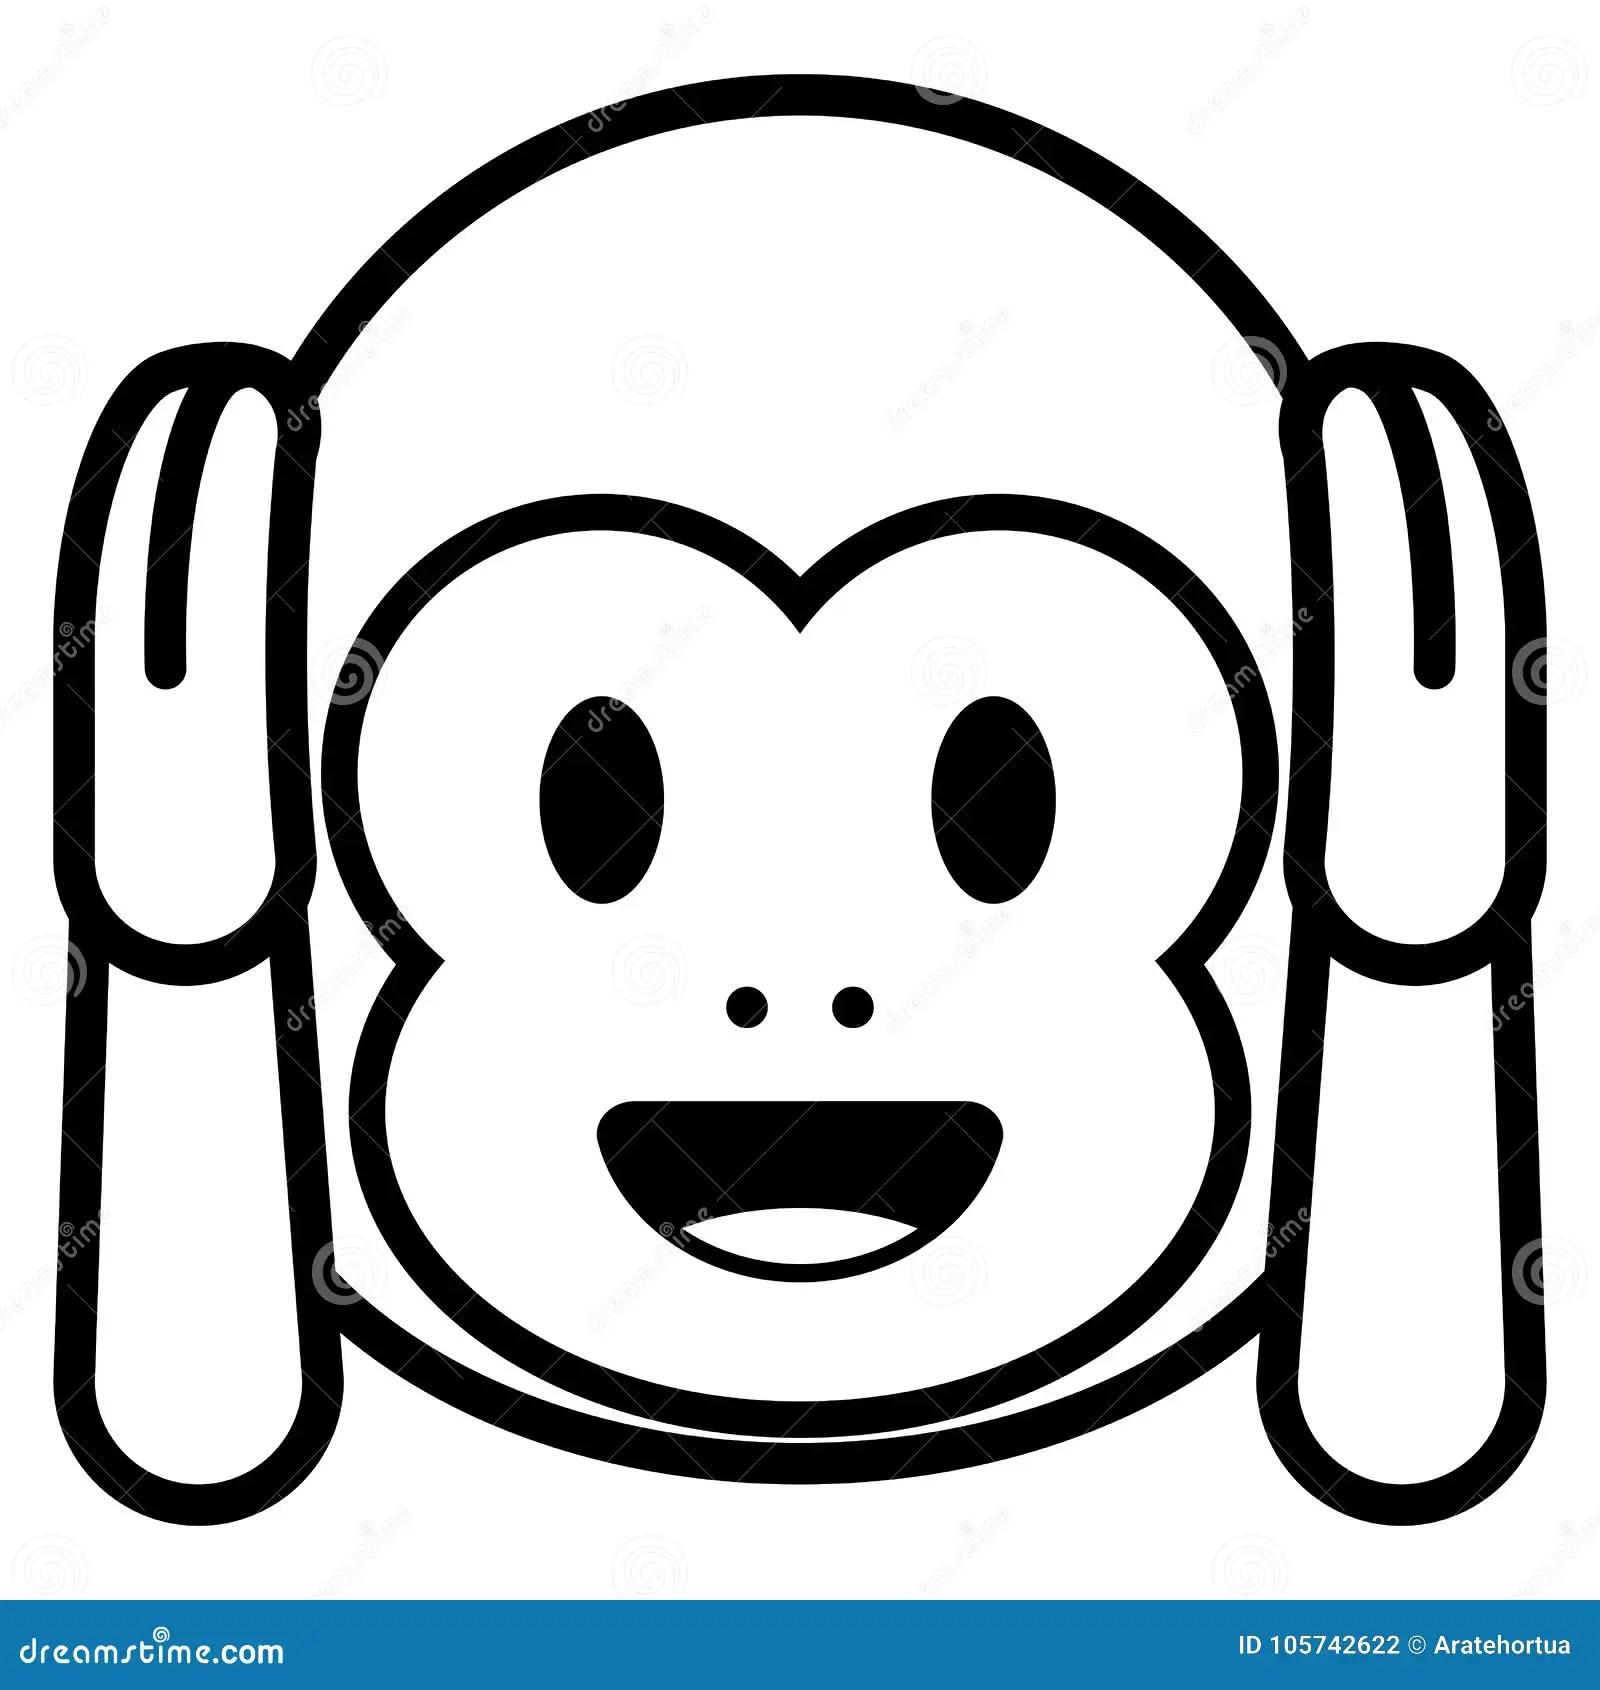 Royalty Free Thumbs Up Emoji Clip Art Vector Images